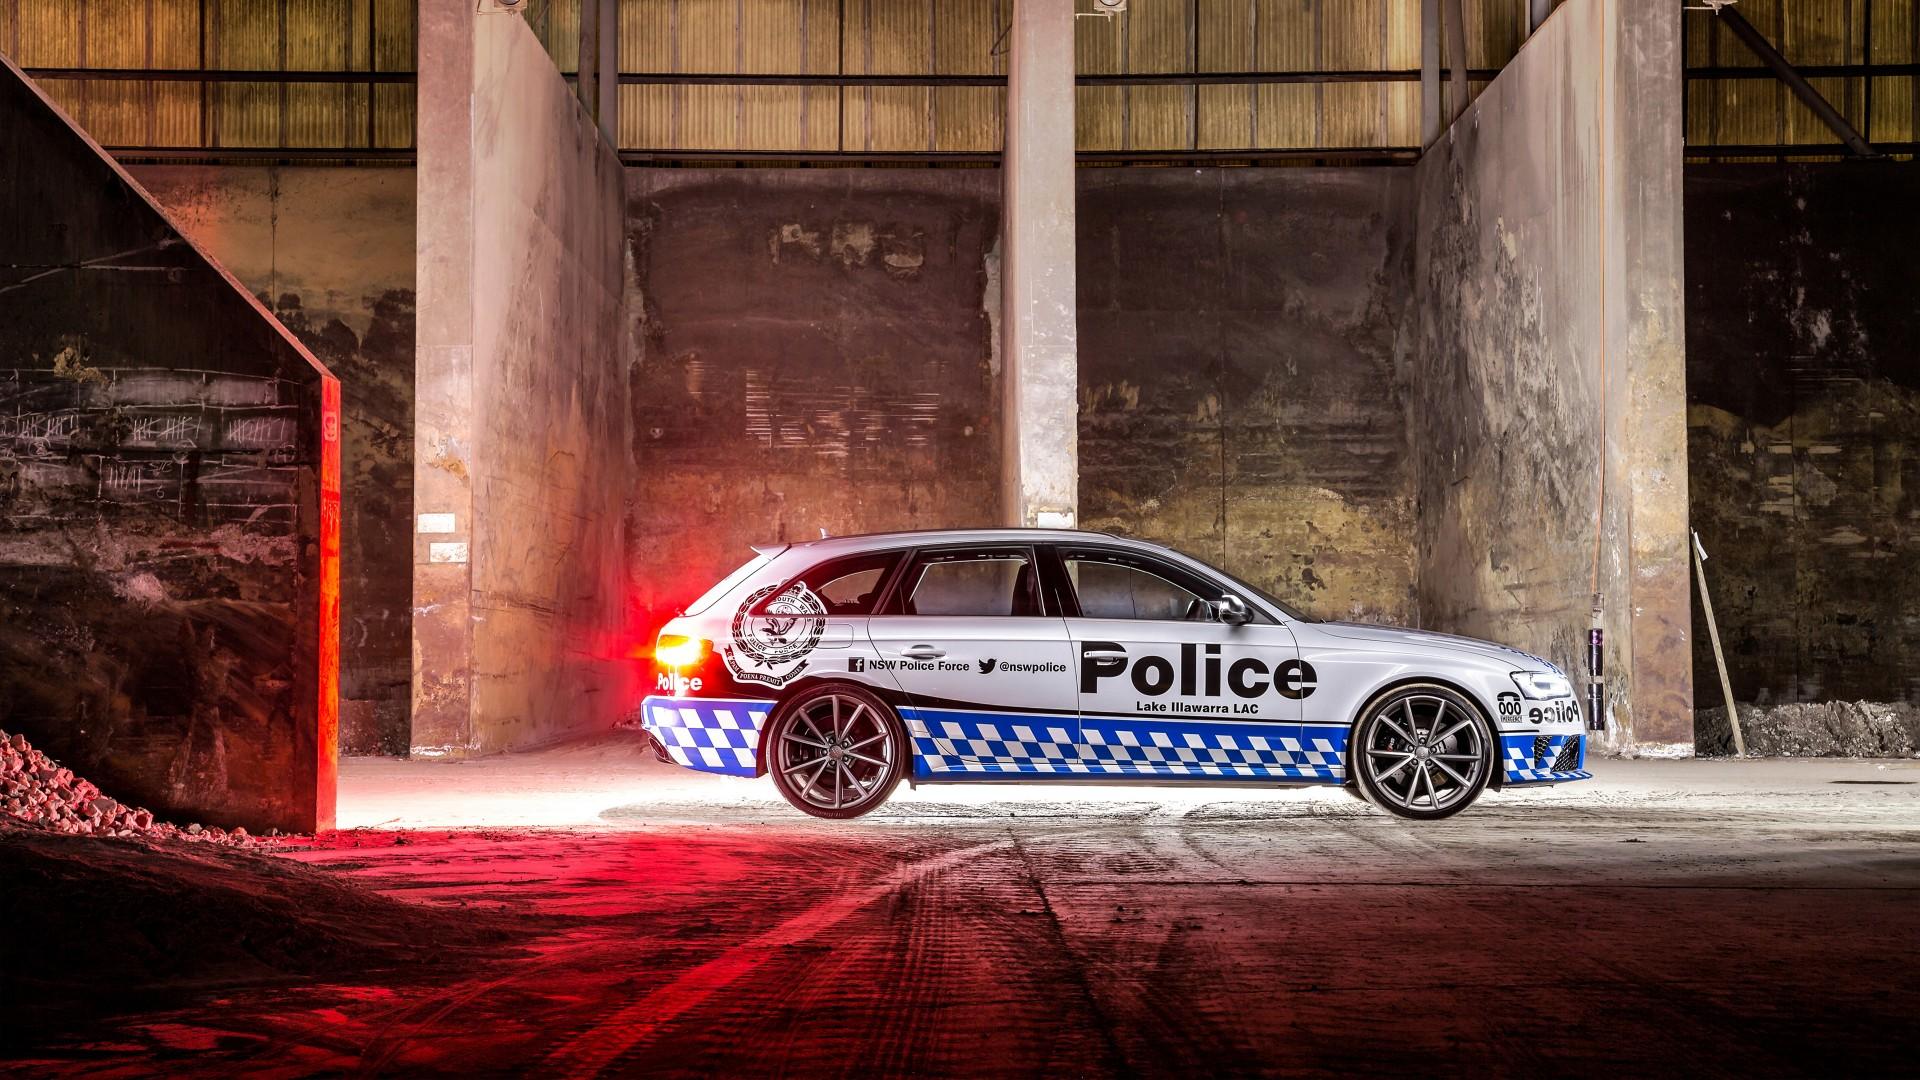 2015 Audi Rs4 Avant Police 2 Wallpaper Hd Car Wallpapers